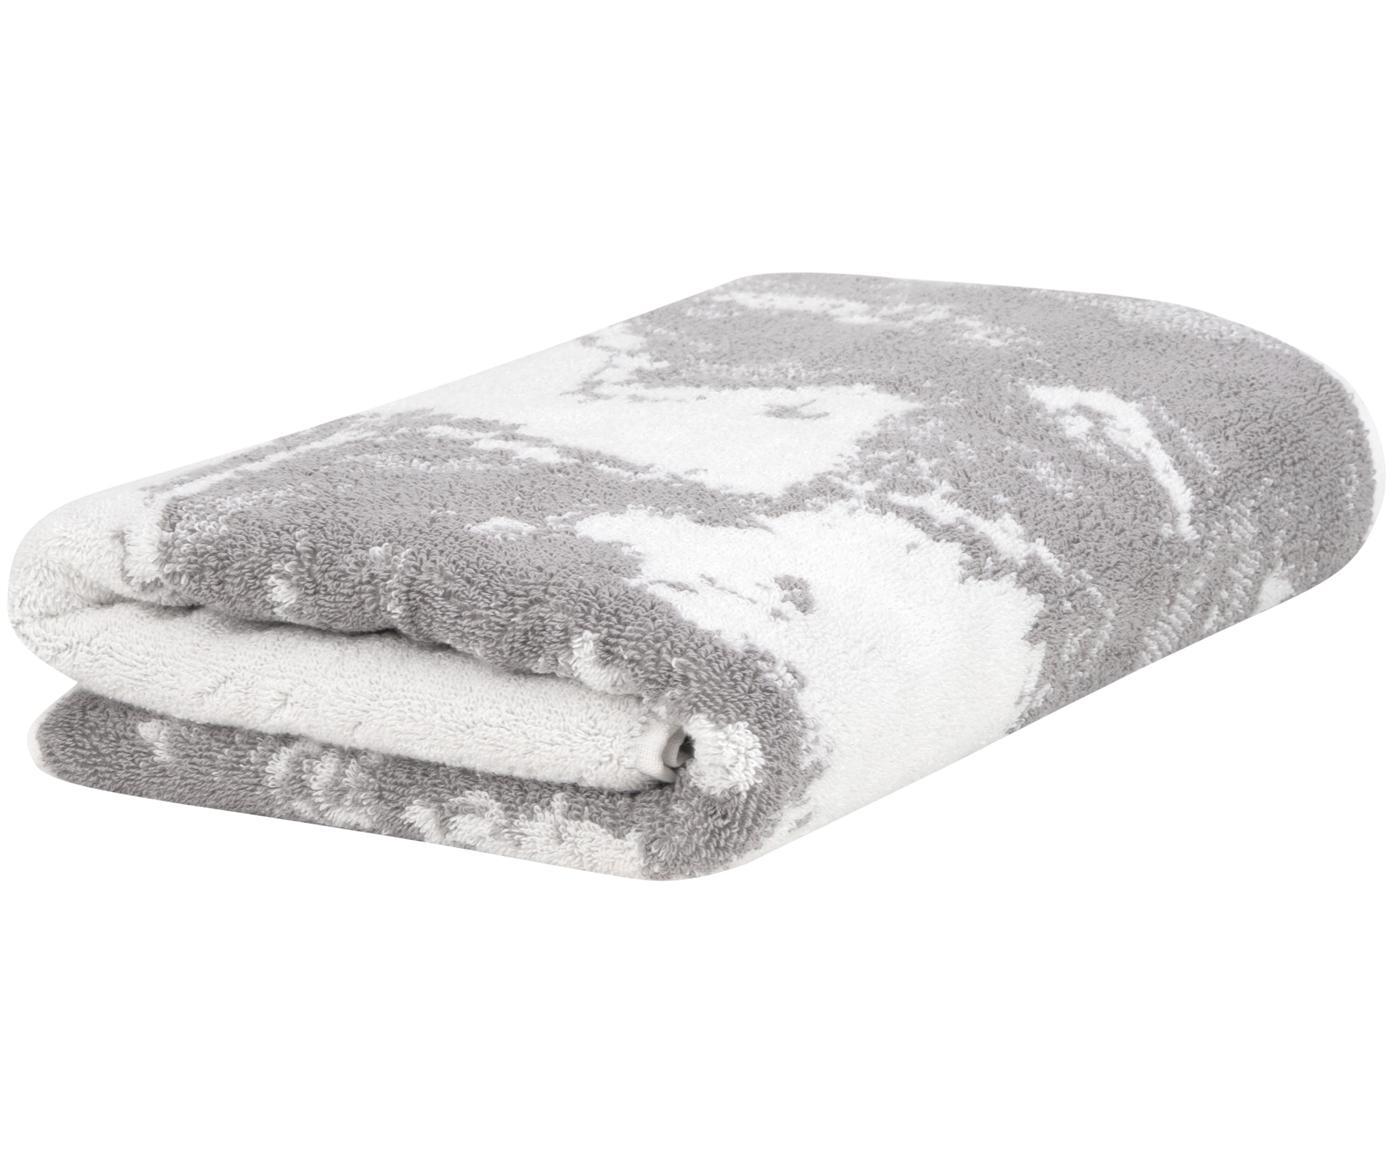 Handdoek Malin met marmer patroon, 100% katoen, middelzware kwaliteit, 550 g/m², Grijs, crèmewit, Gastenhanddoek